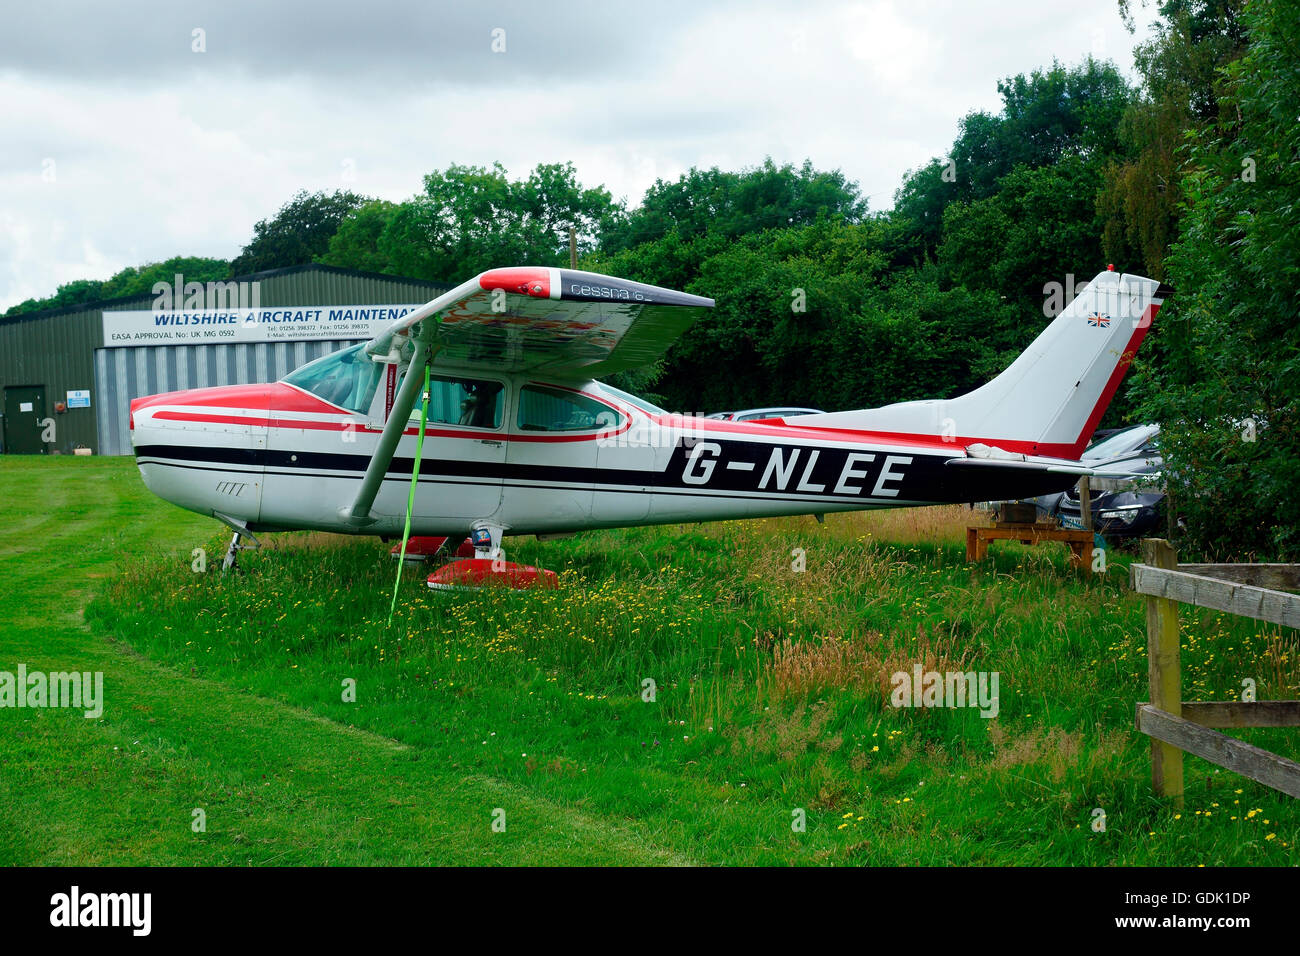 CESSNA 182Q SKYLANE  G-NLEE UNDER RESTORATION NO ENGINE / PROP. - Stock Image